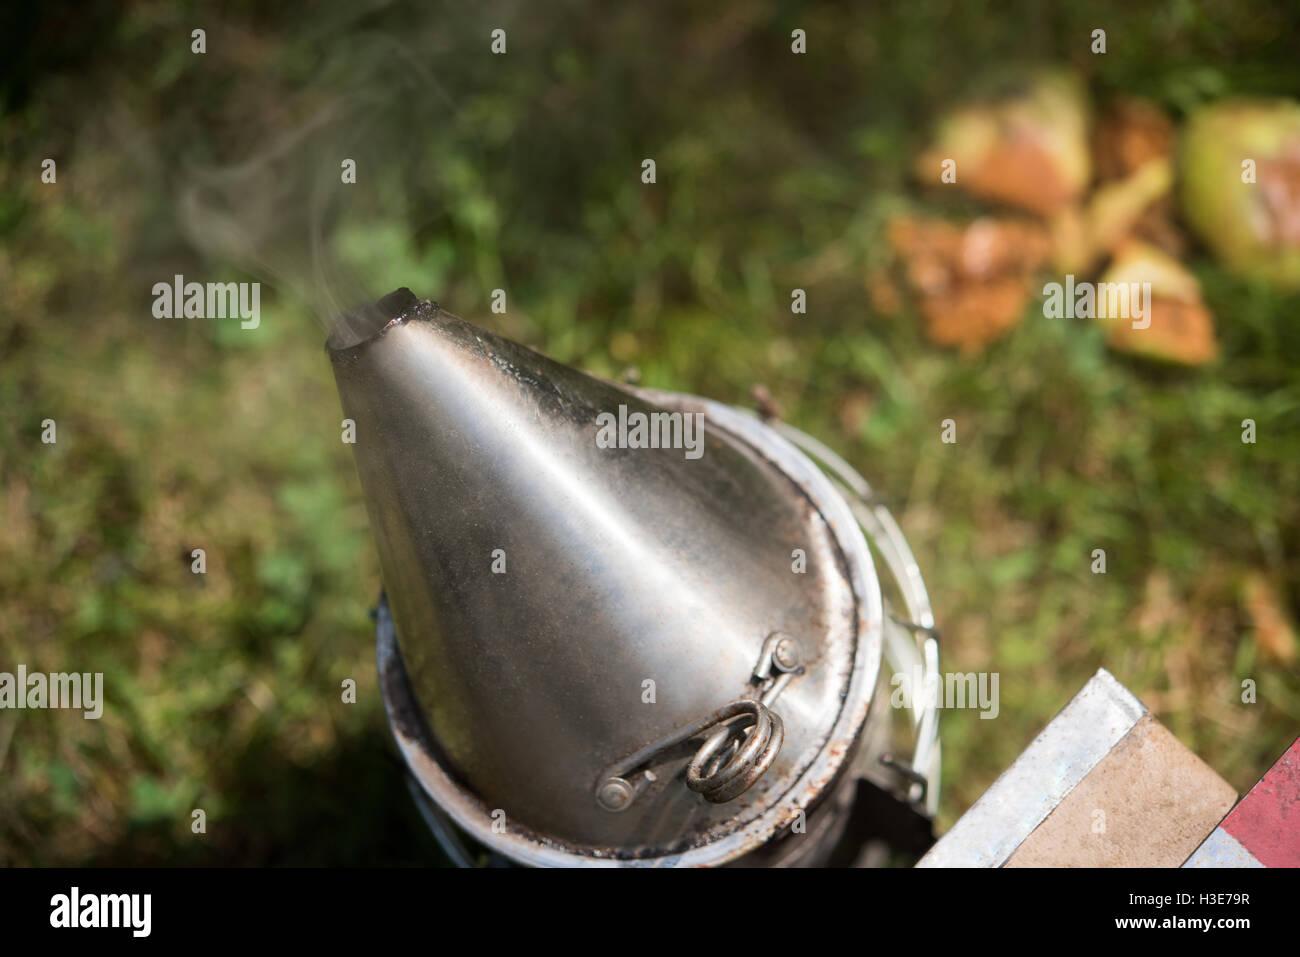 Bee smoker in apiary garden - Stock Image